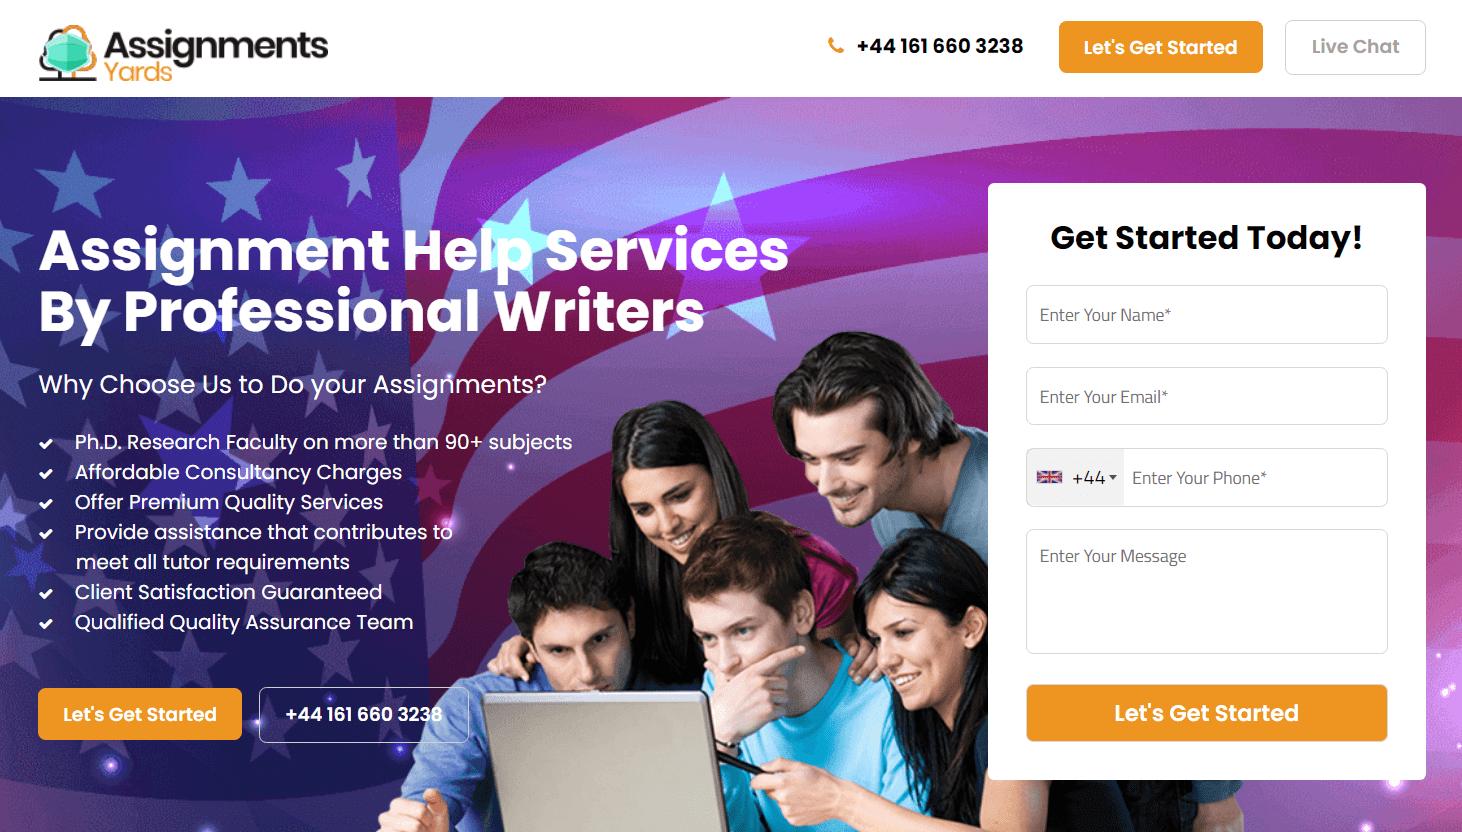 assignmentsyard.com